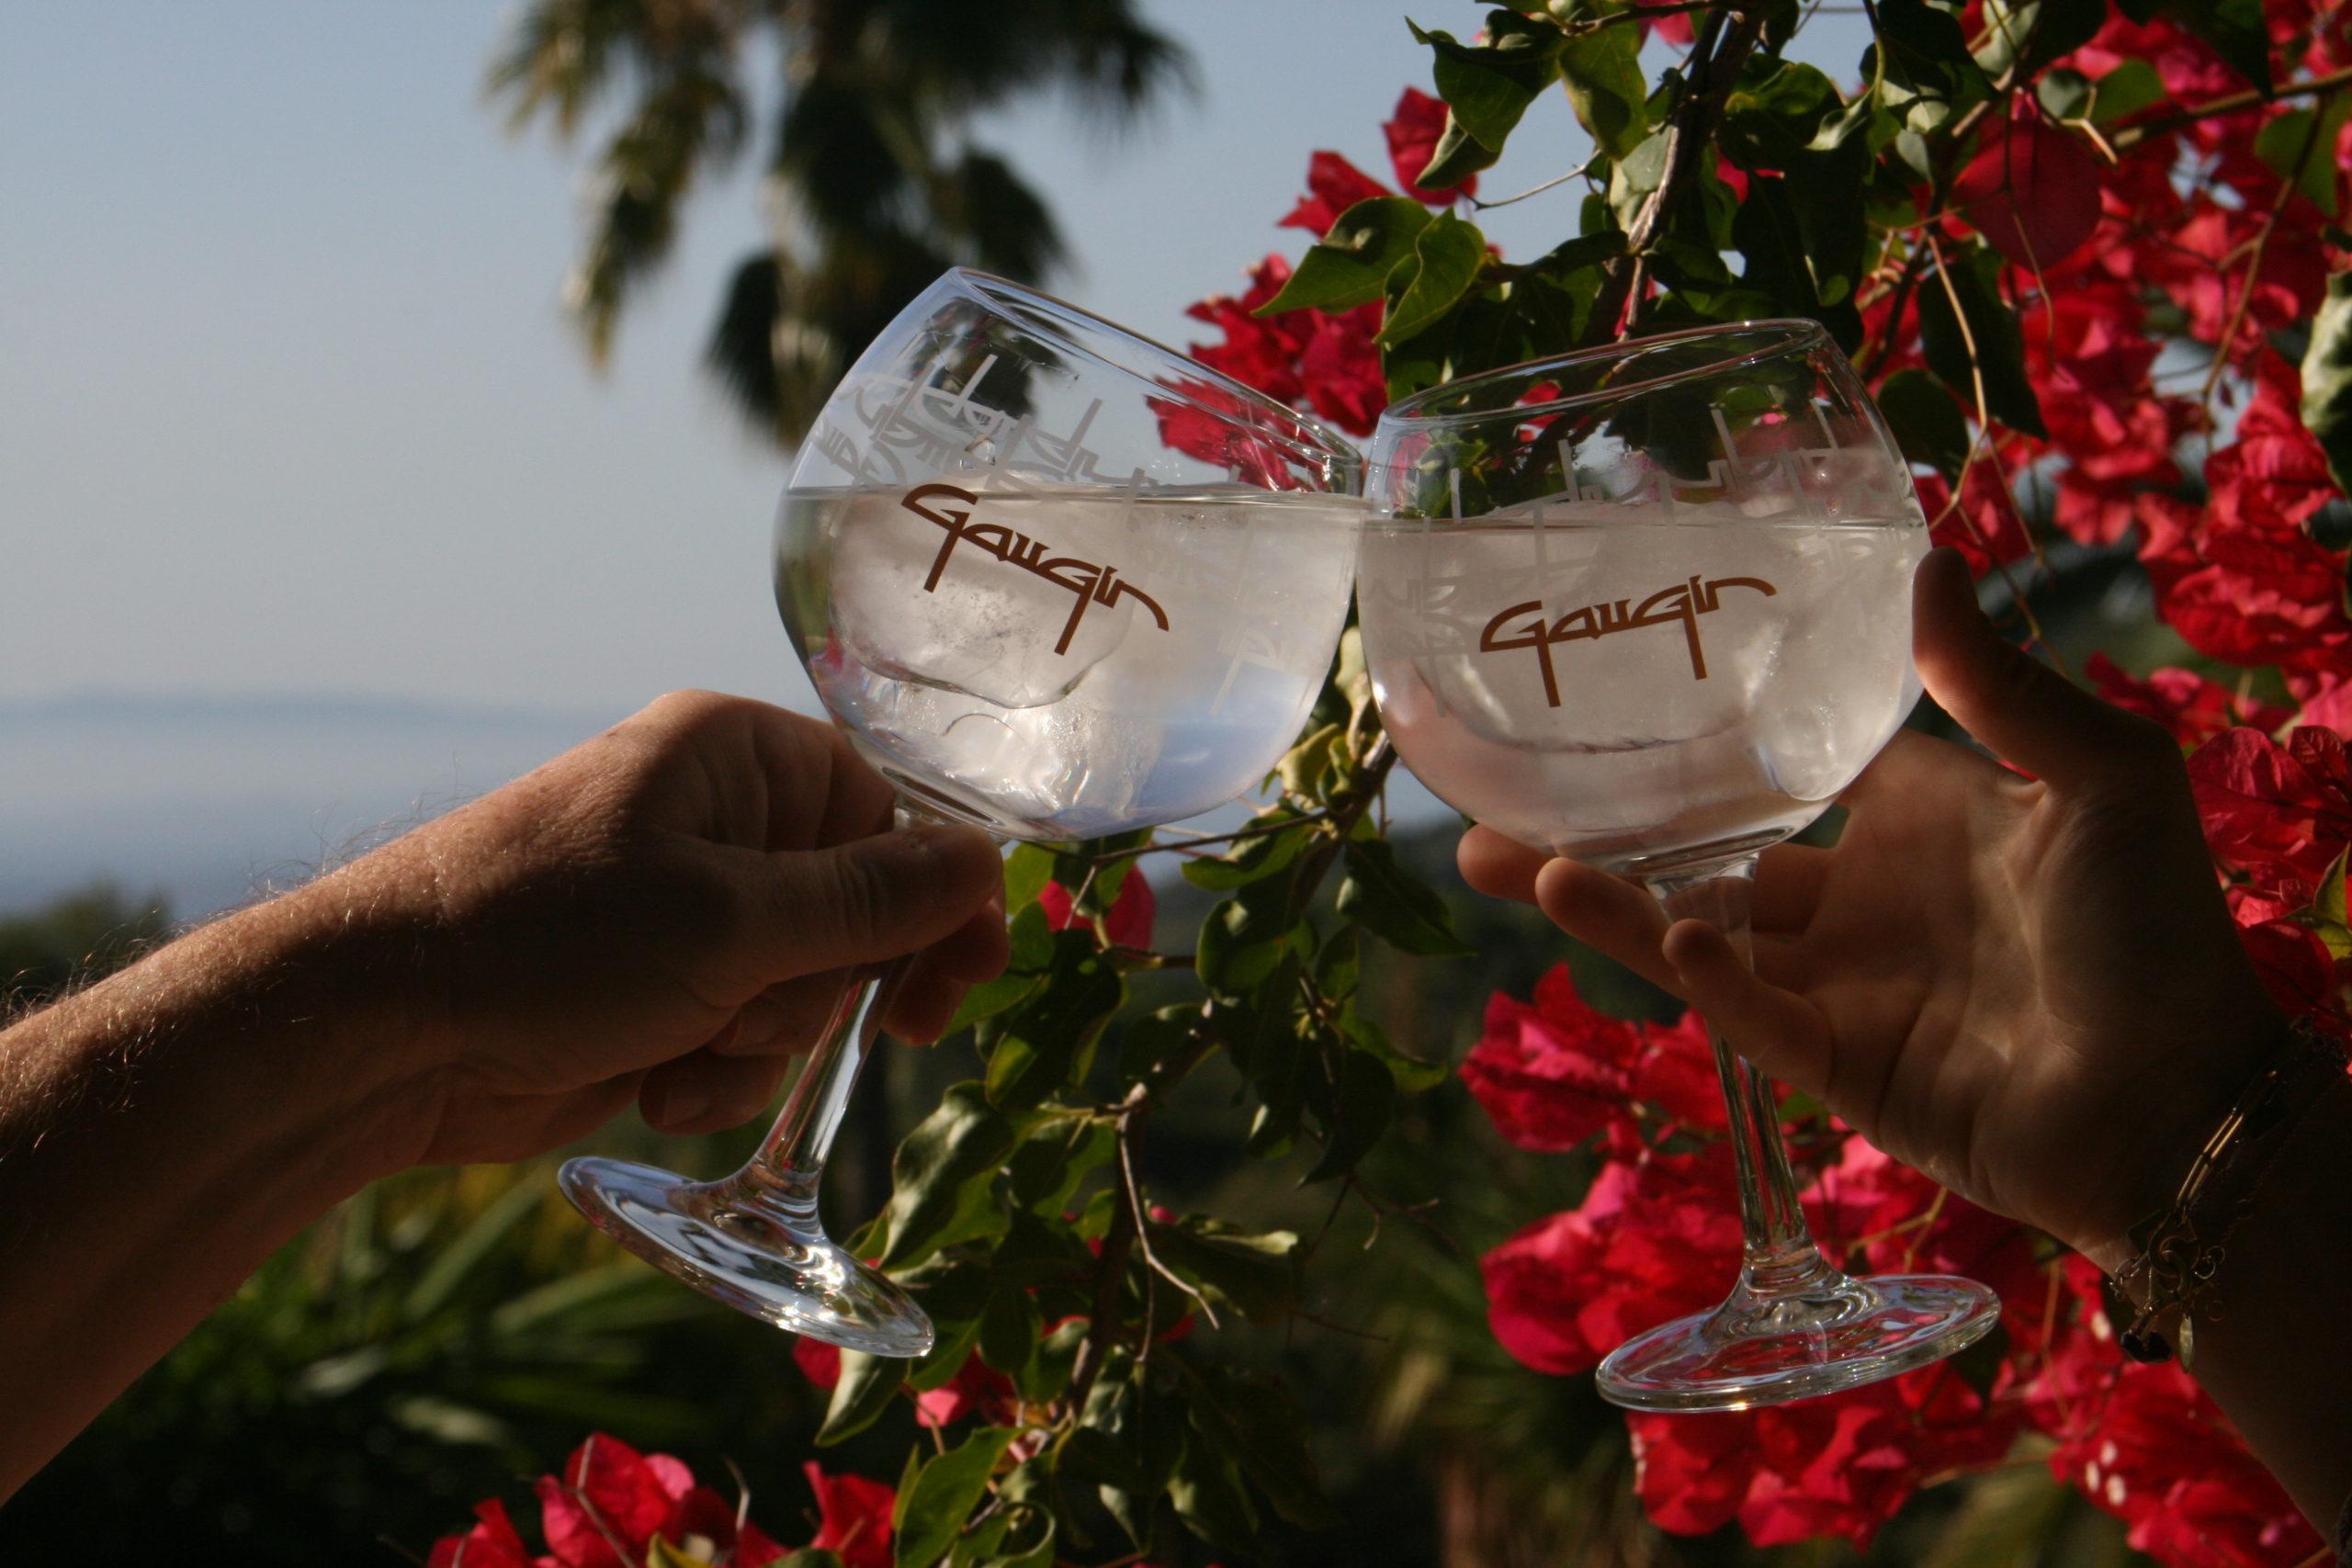 Premium gin Gaugin